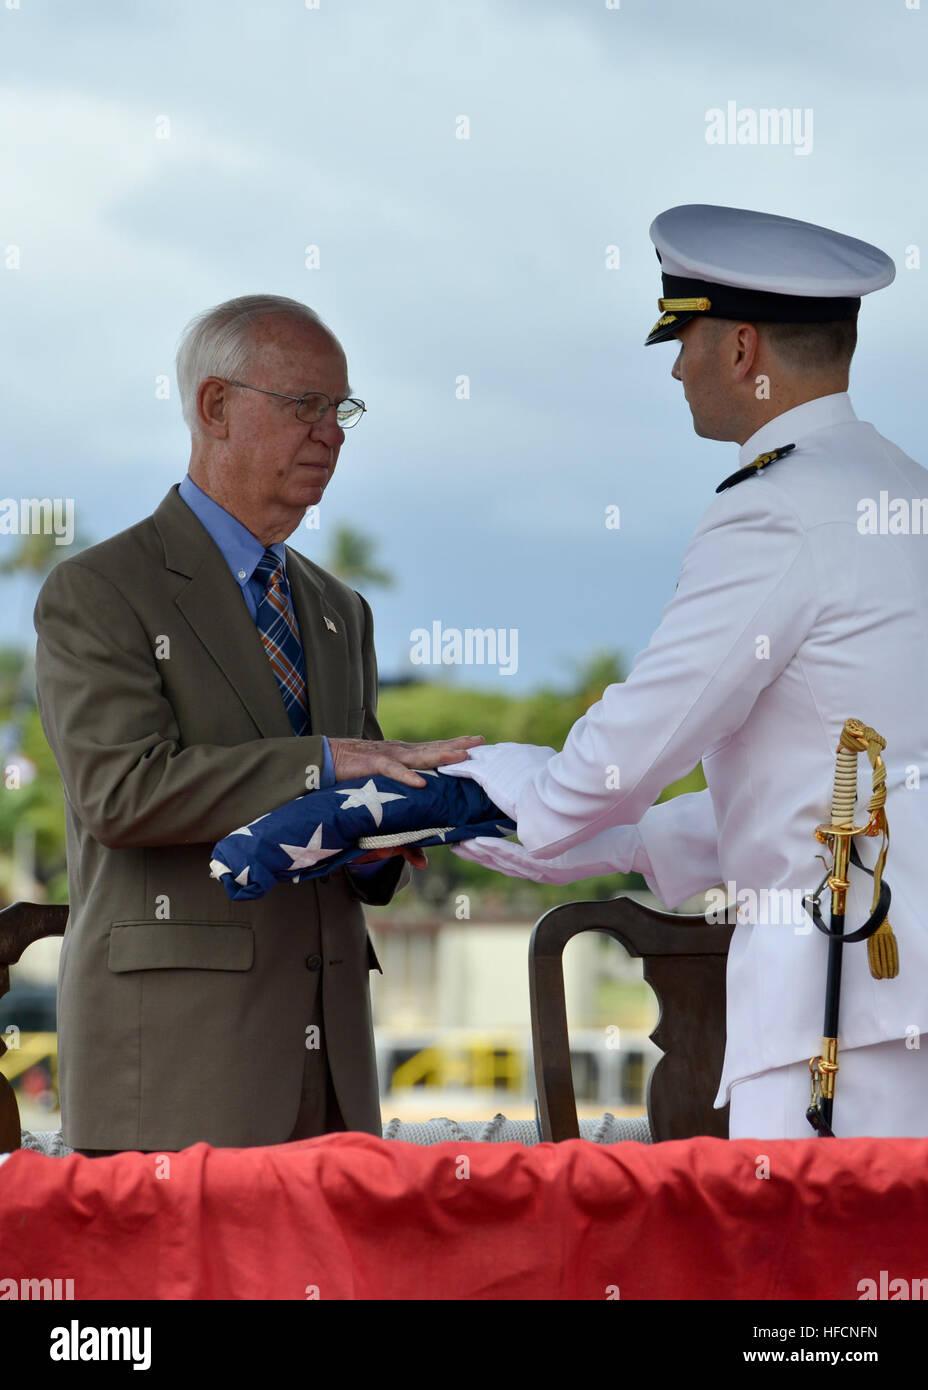 160530-N-LY160-433 JOINT BASE PEARL HARBOR-HICKAM, Hawaii (May 30, 2016) Commander Travis M. Petzoldt, commanding - Stock Image